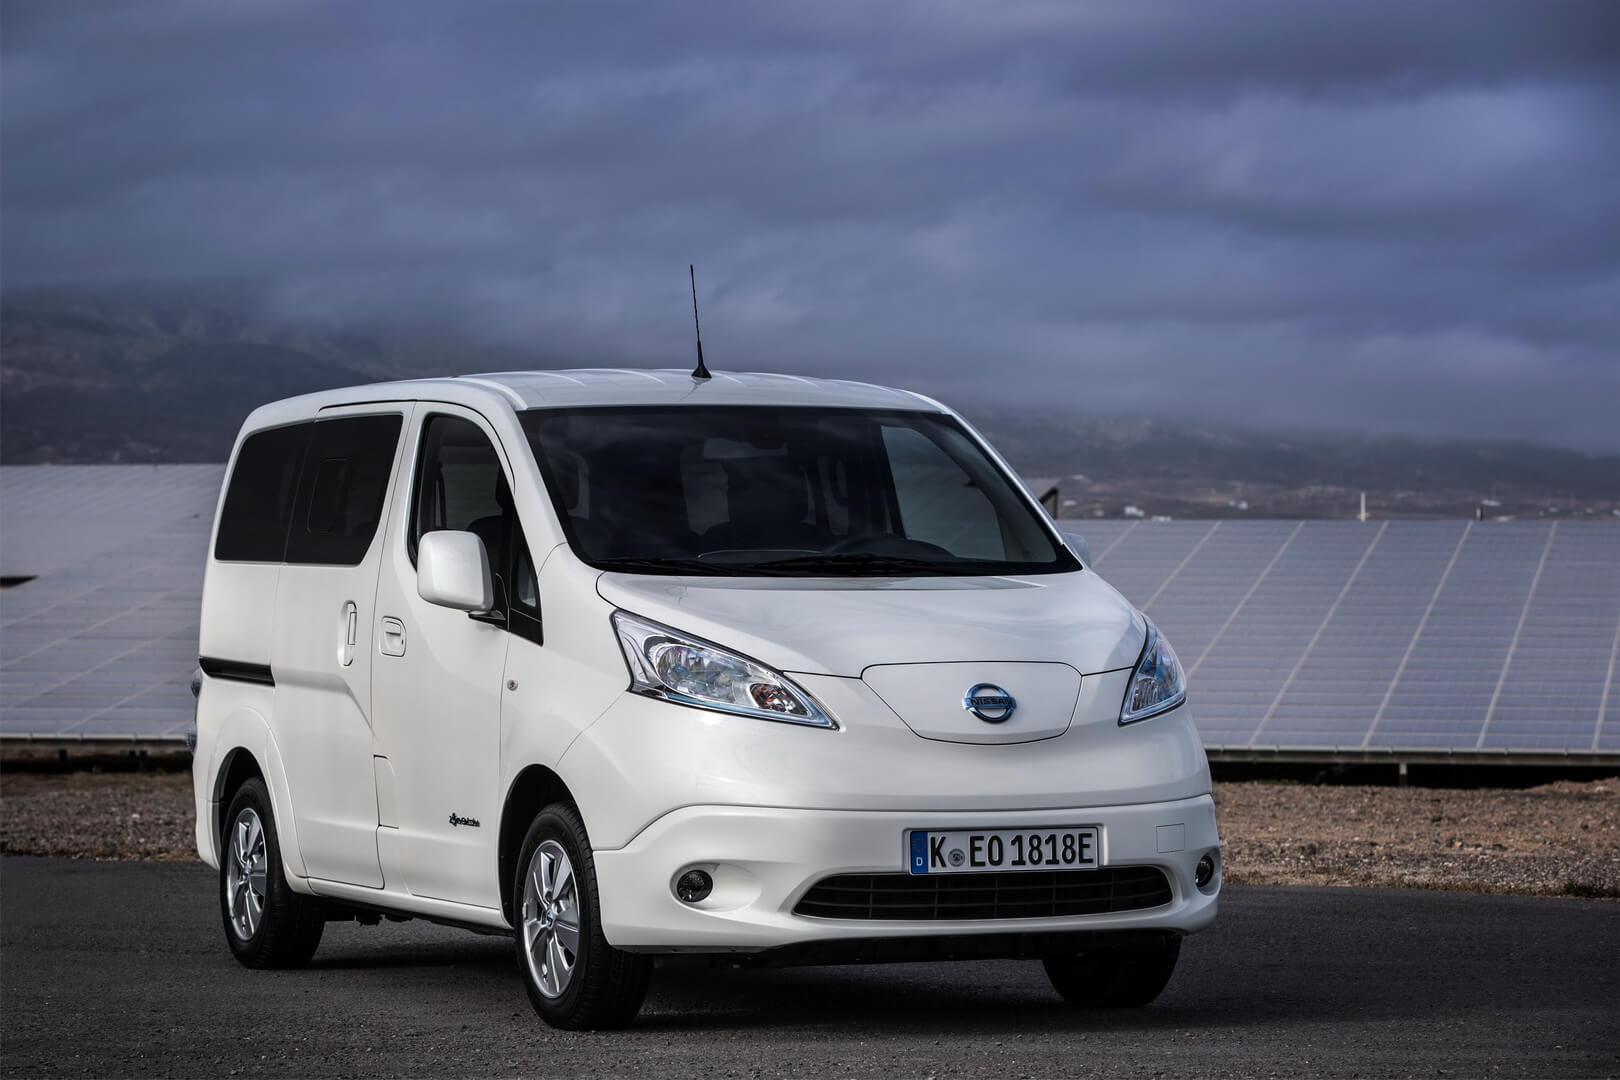 Электрический фургон Nissan e-NV200 с батареей емкостью 40 кВт•ч